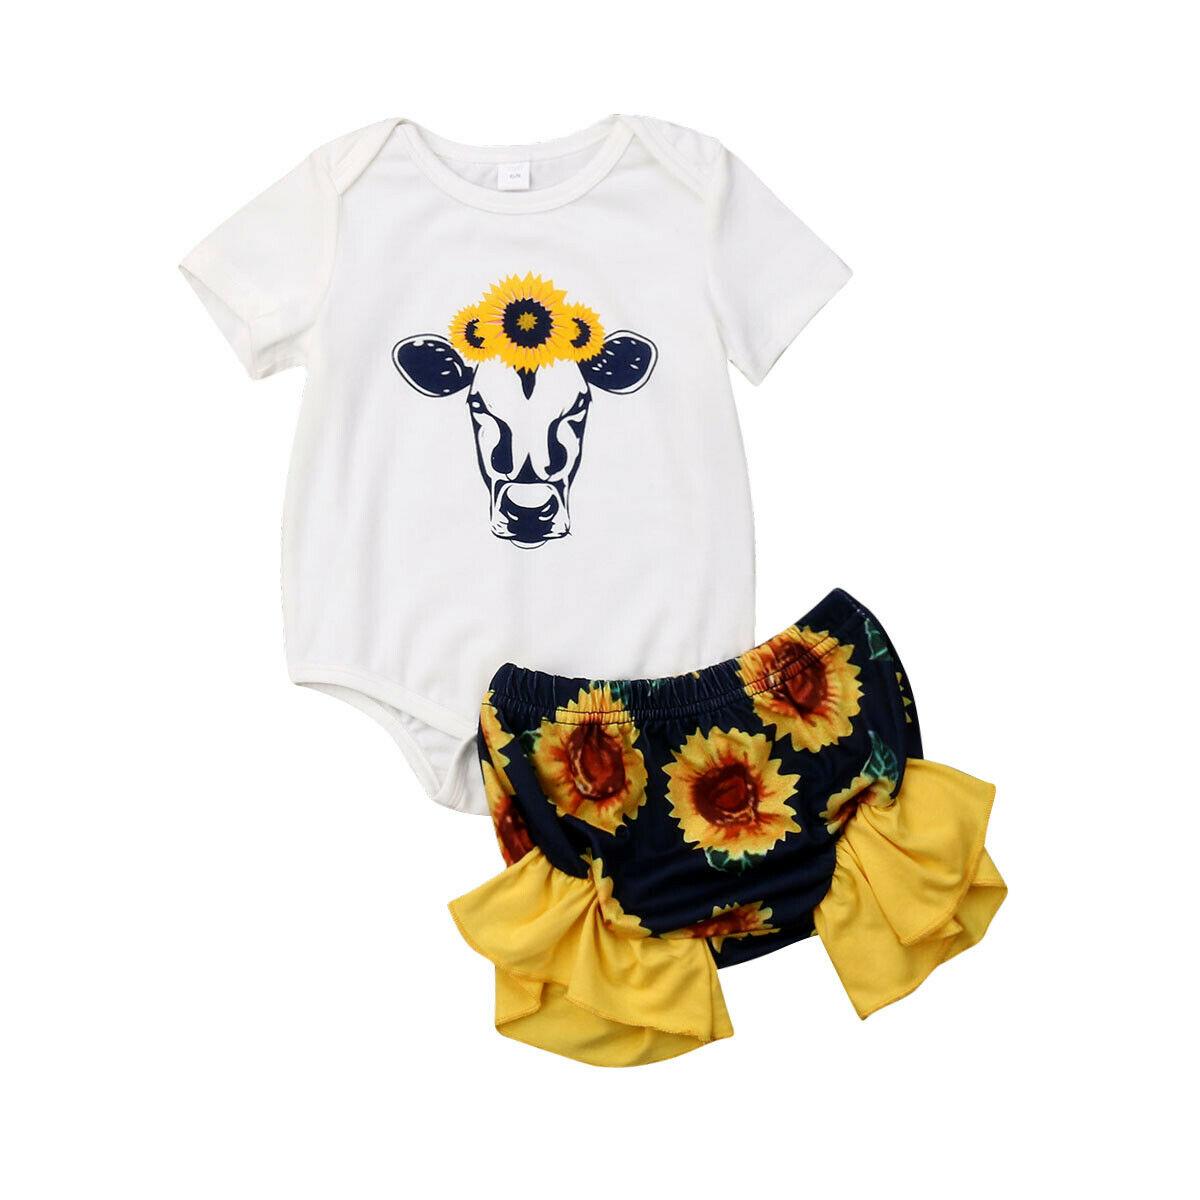 0-24 M Leuke Pasgeboren Baby Meisje Korte Mouw Herten Romper Tops Zonnebloem Shorts Bloeiers 2 Stuks Outfits Zomer Kleding Set